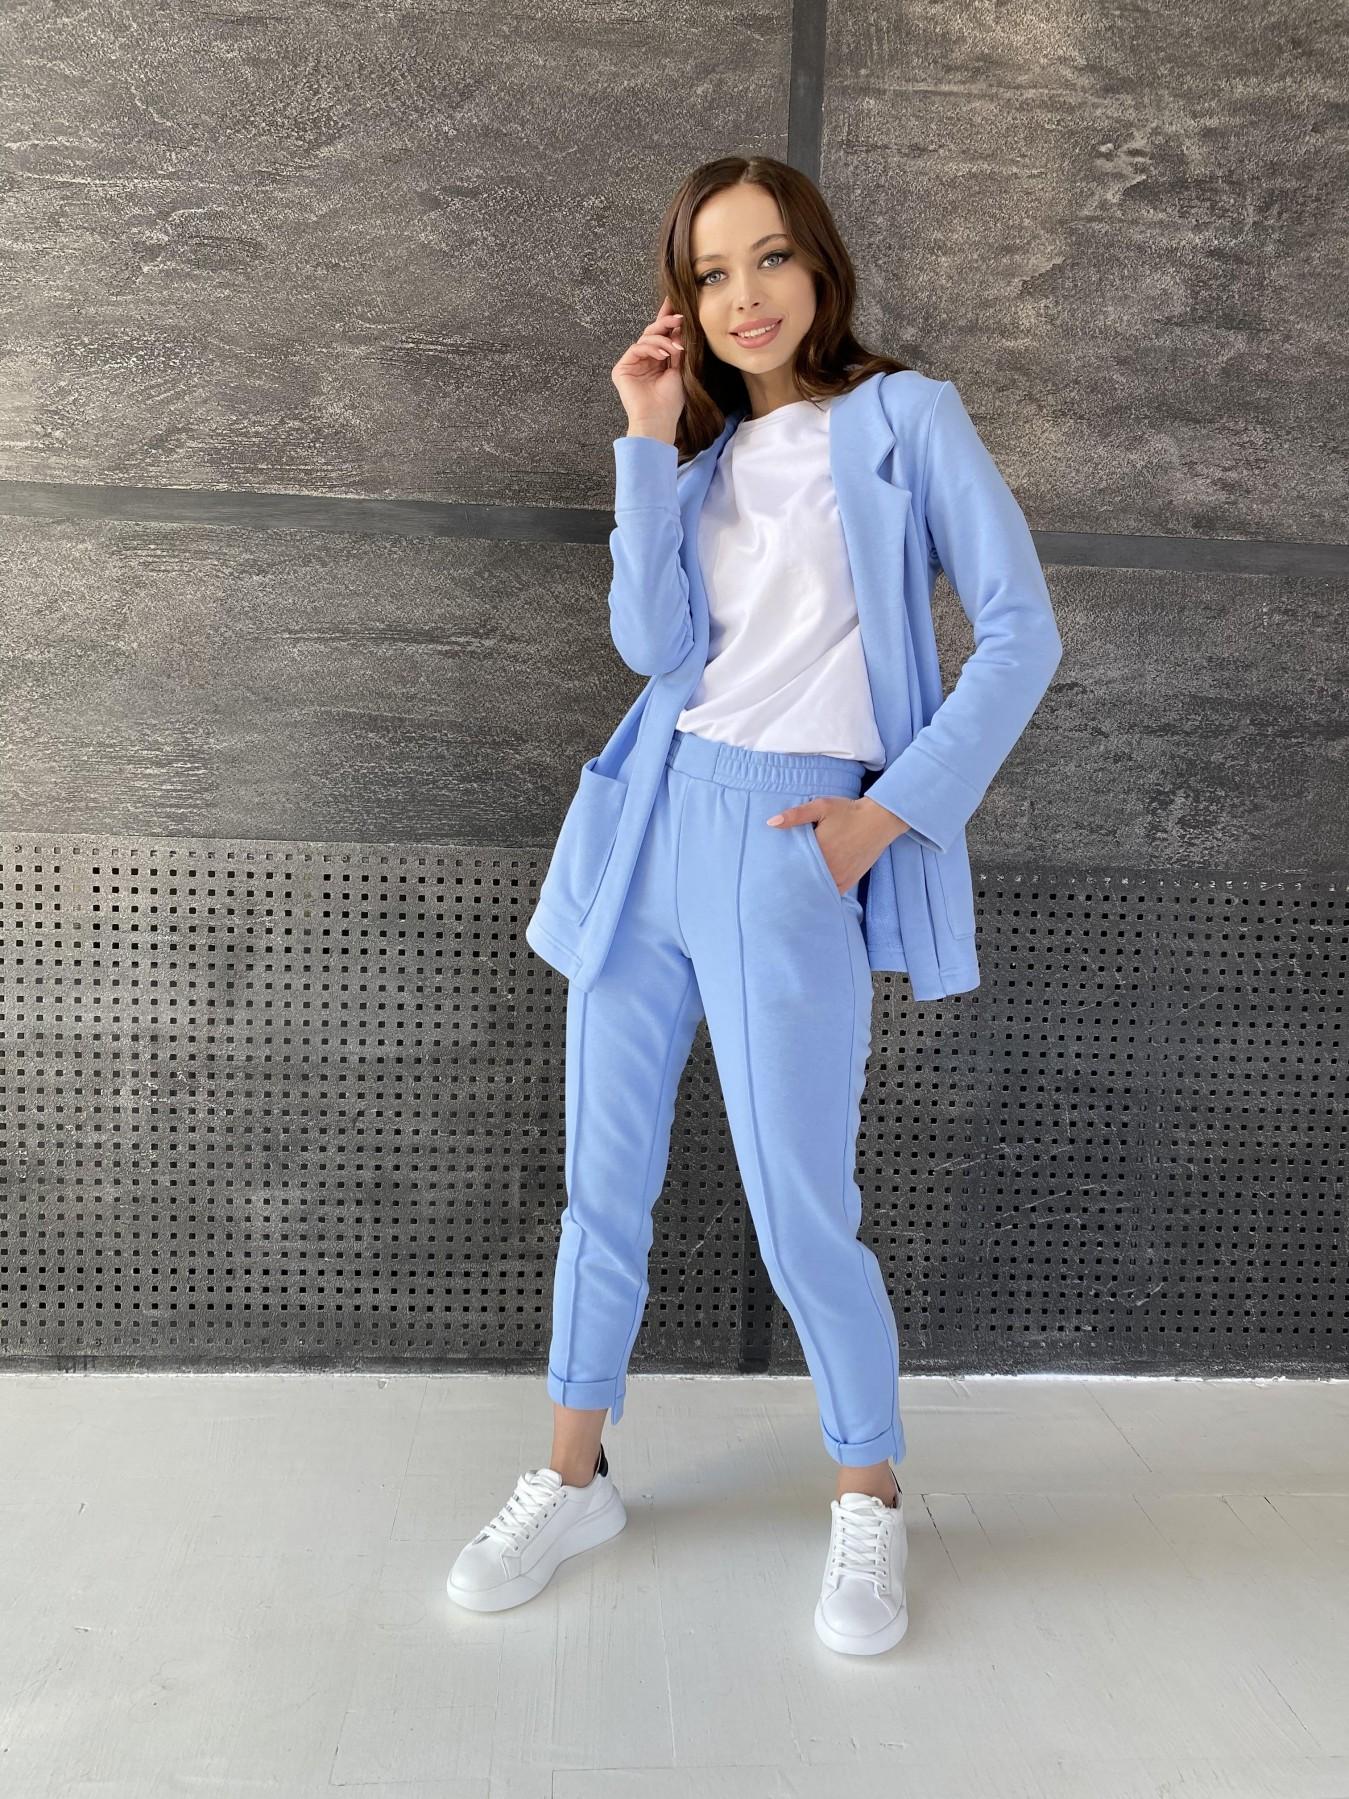 Аурис костюм трикотажный из  3х нитки 11083 АРТ. 47577 Цвет: Голубой - фото 7, интернет магазин tm-modus.ru